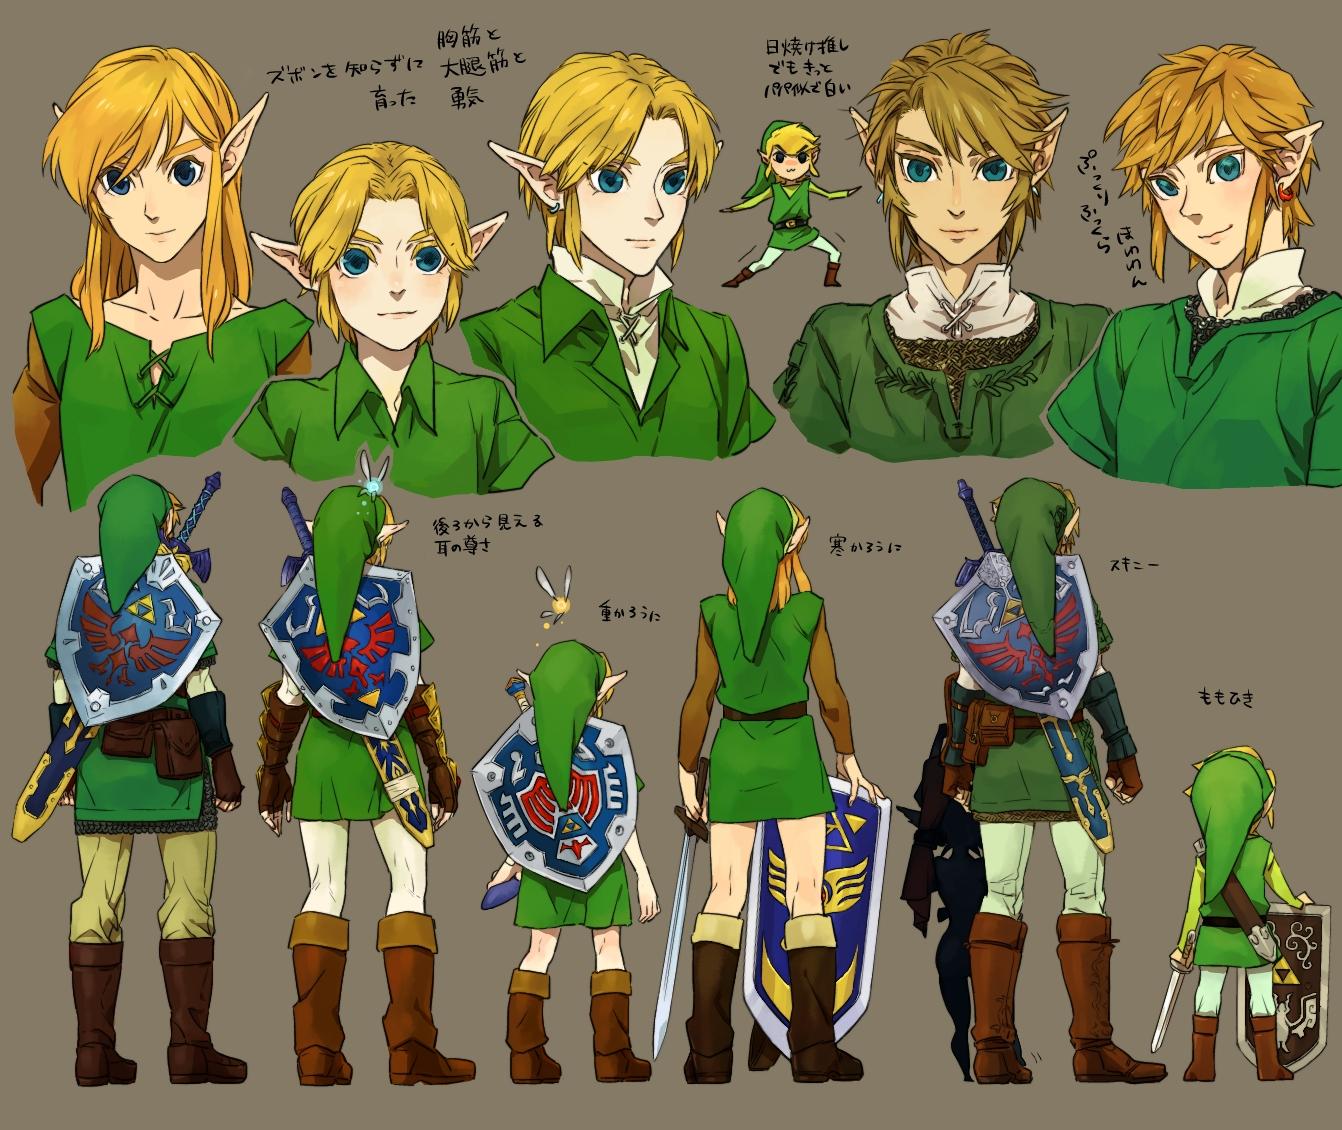 Zelda No Densetsu The Legend Of Zelda Image 1700725